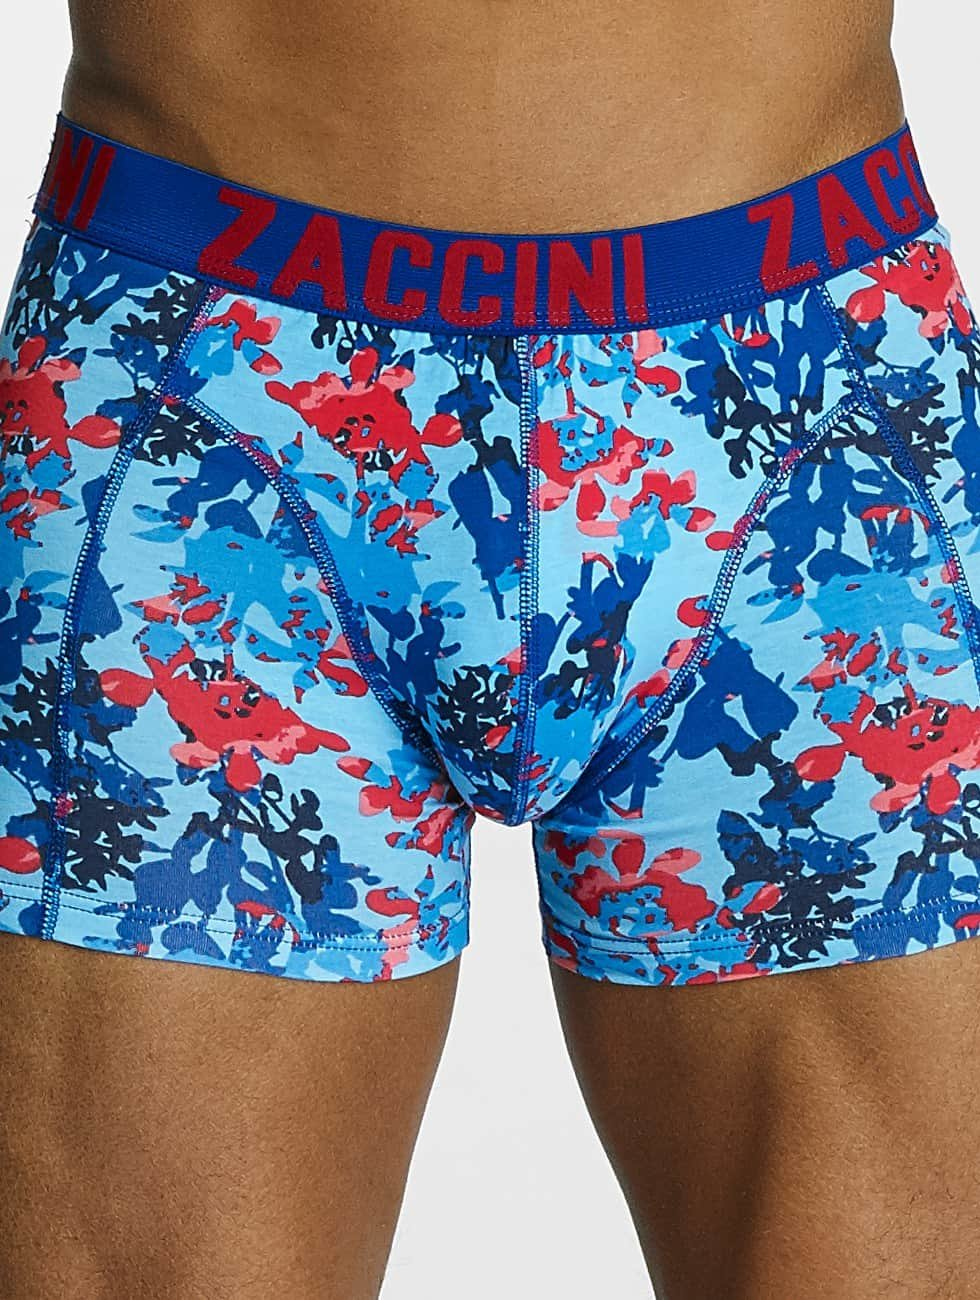 Zaccini Boxershorts Painted Spring blau